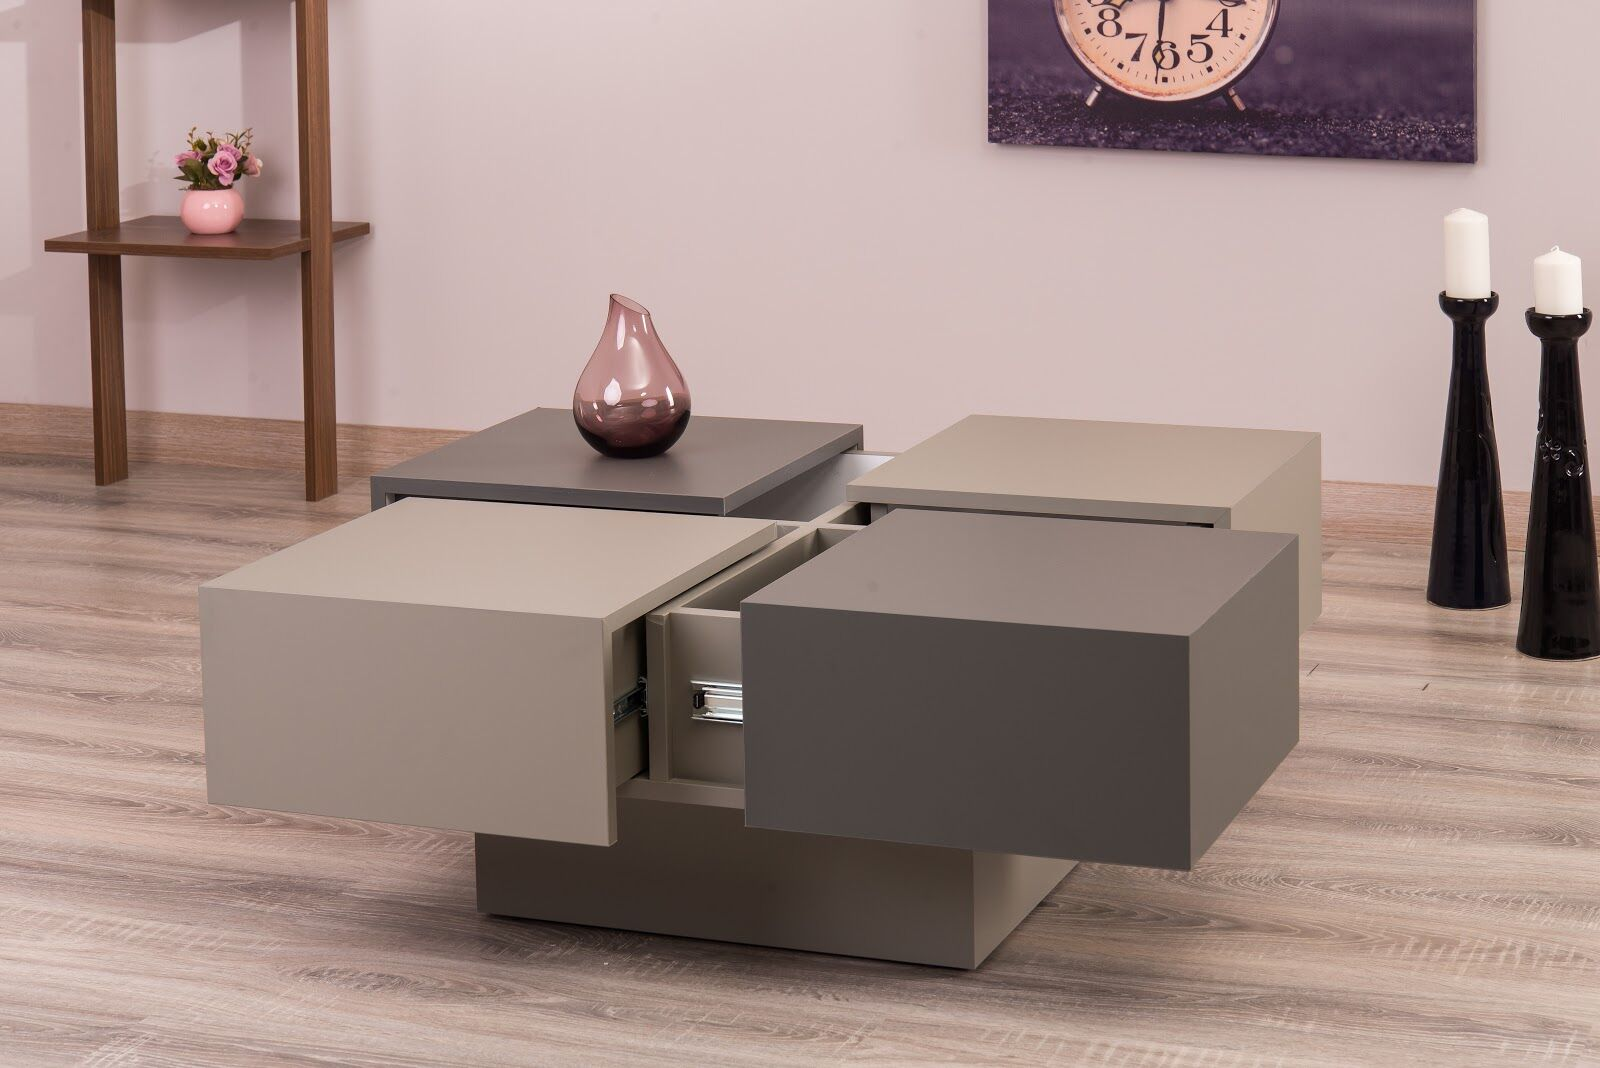 Reyer Coffee Table Color: Gray